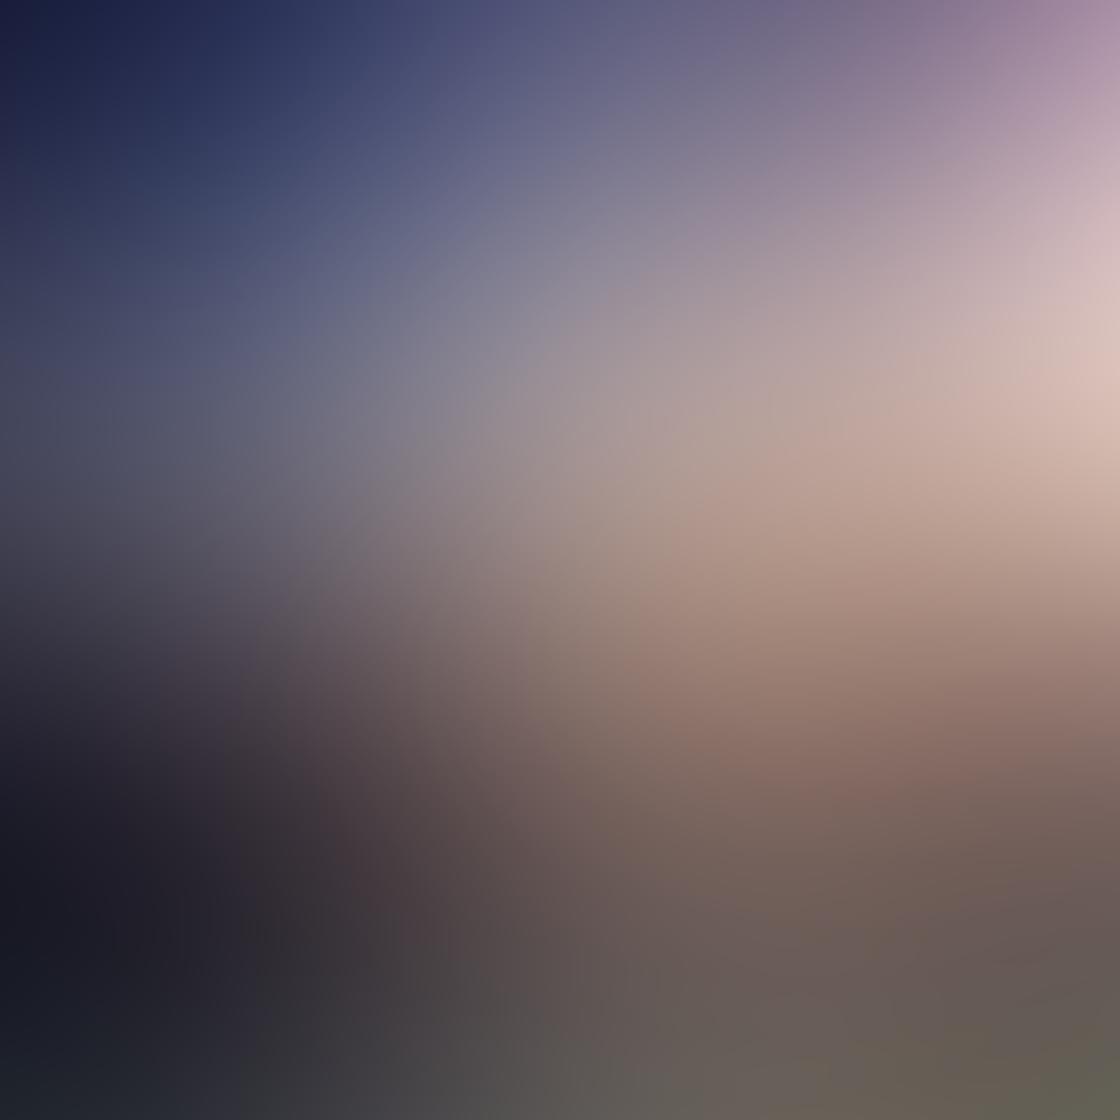 iPhone Weather Photo 24